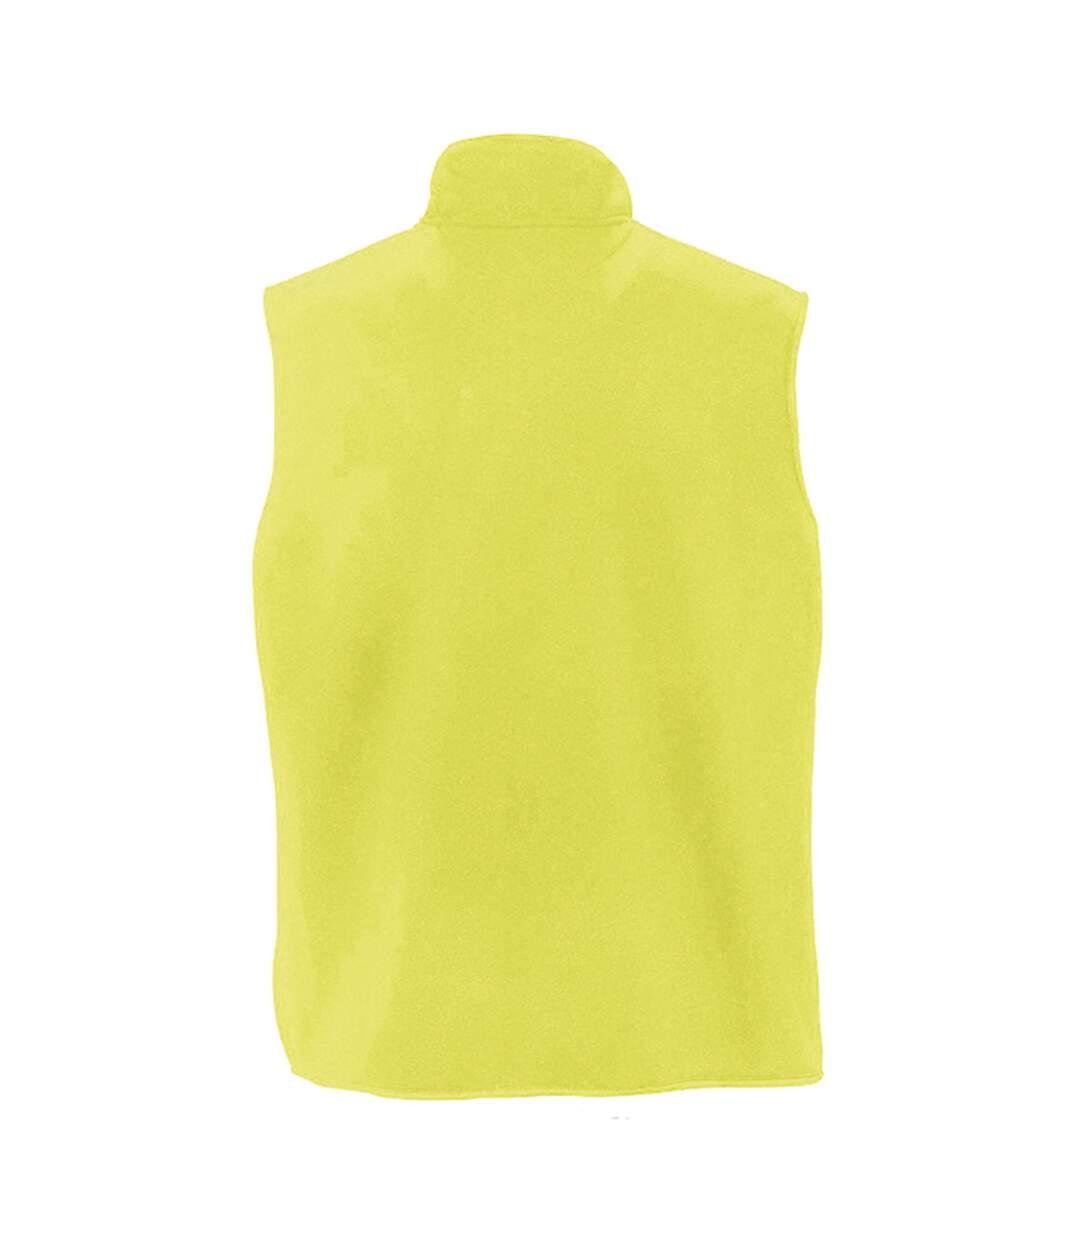 SOLS Norway Unisex Anti-Pill Fleece Bodywarmer / Gilet (Neon Yellow) - UTPC346